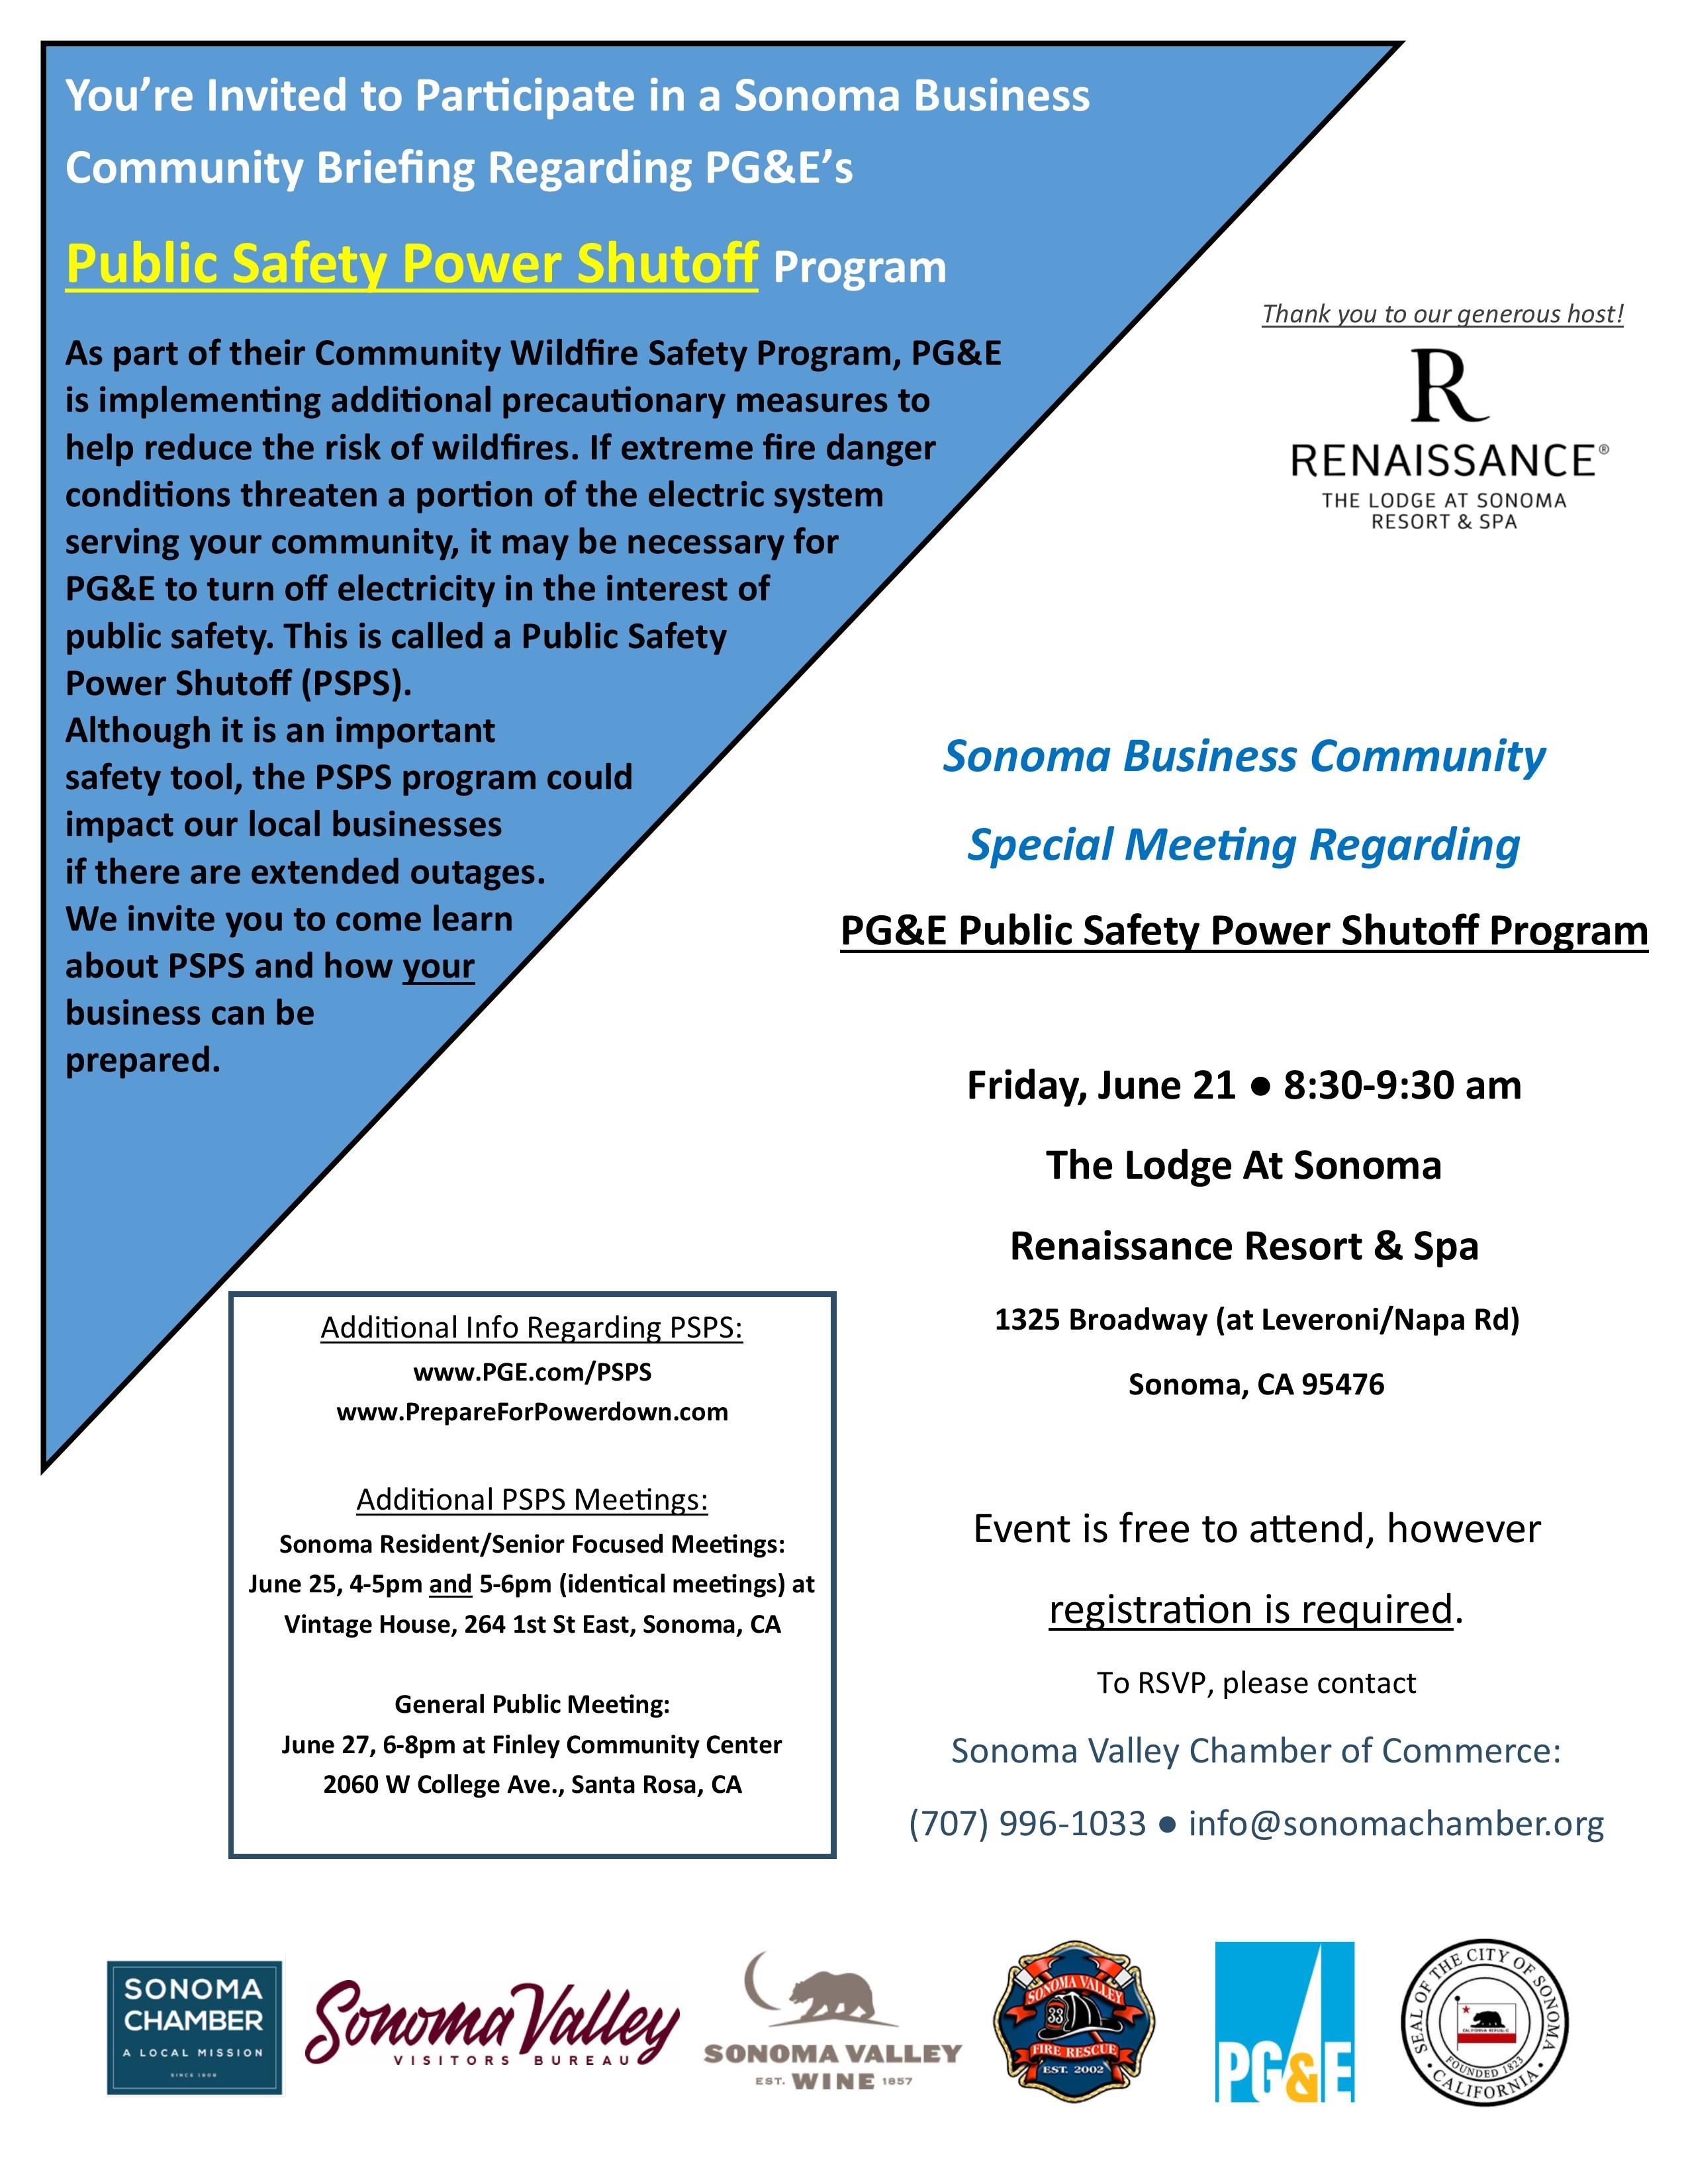 PSPS Meeting